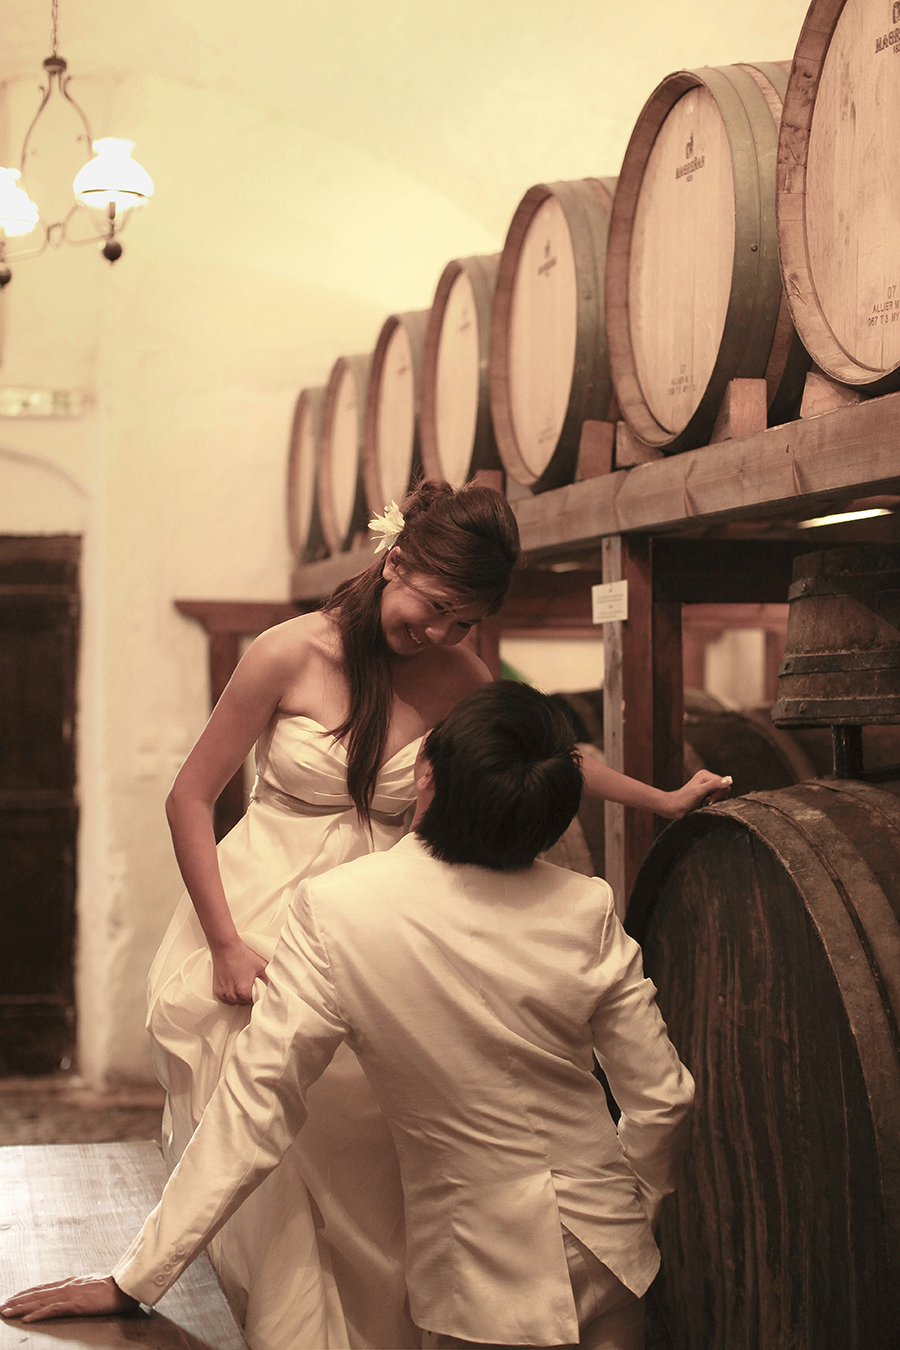 santorini greece . wedding photography by kurt ahs . 3076.jpg